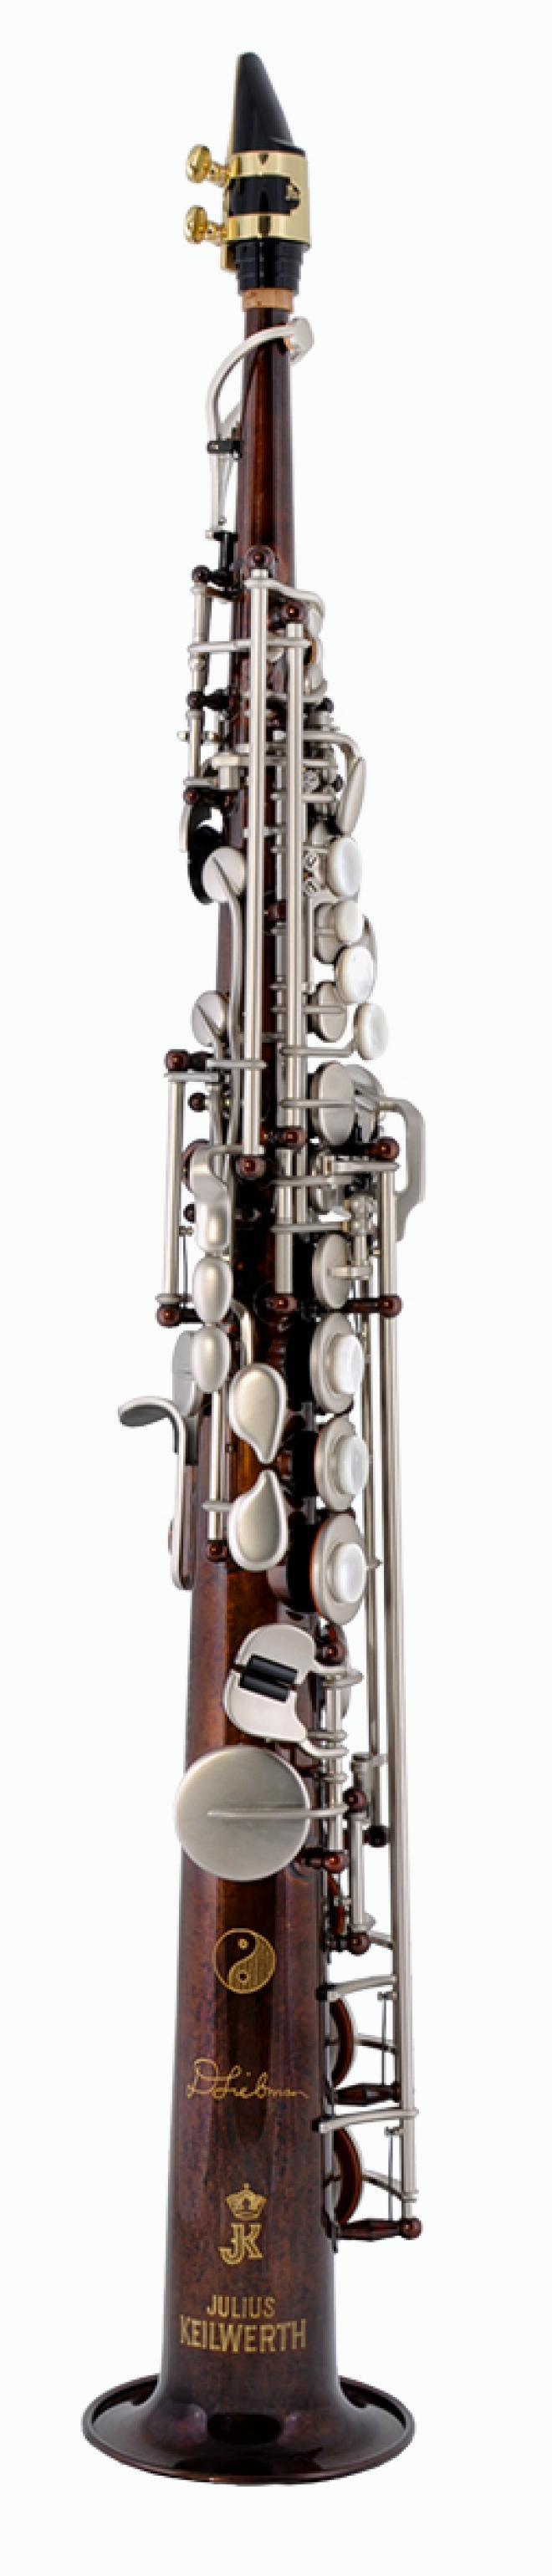 "Keilwerth Model JK1300-8DLS Lieberman Soprano Sax - Signature Model ""SX90"""